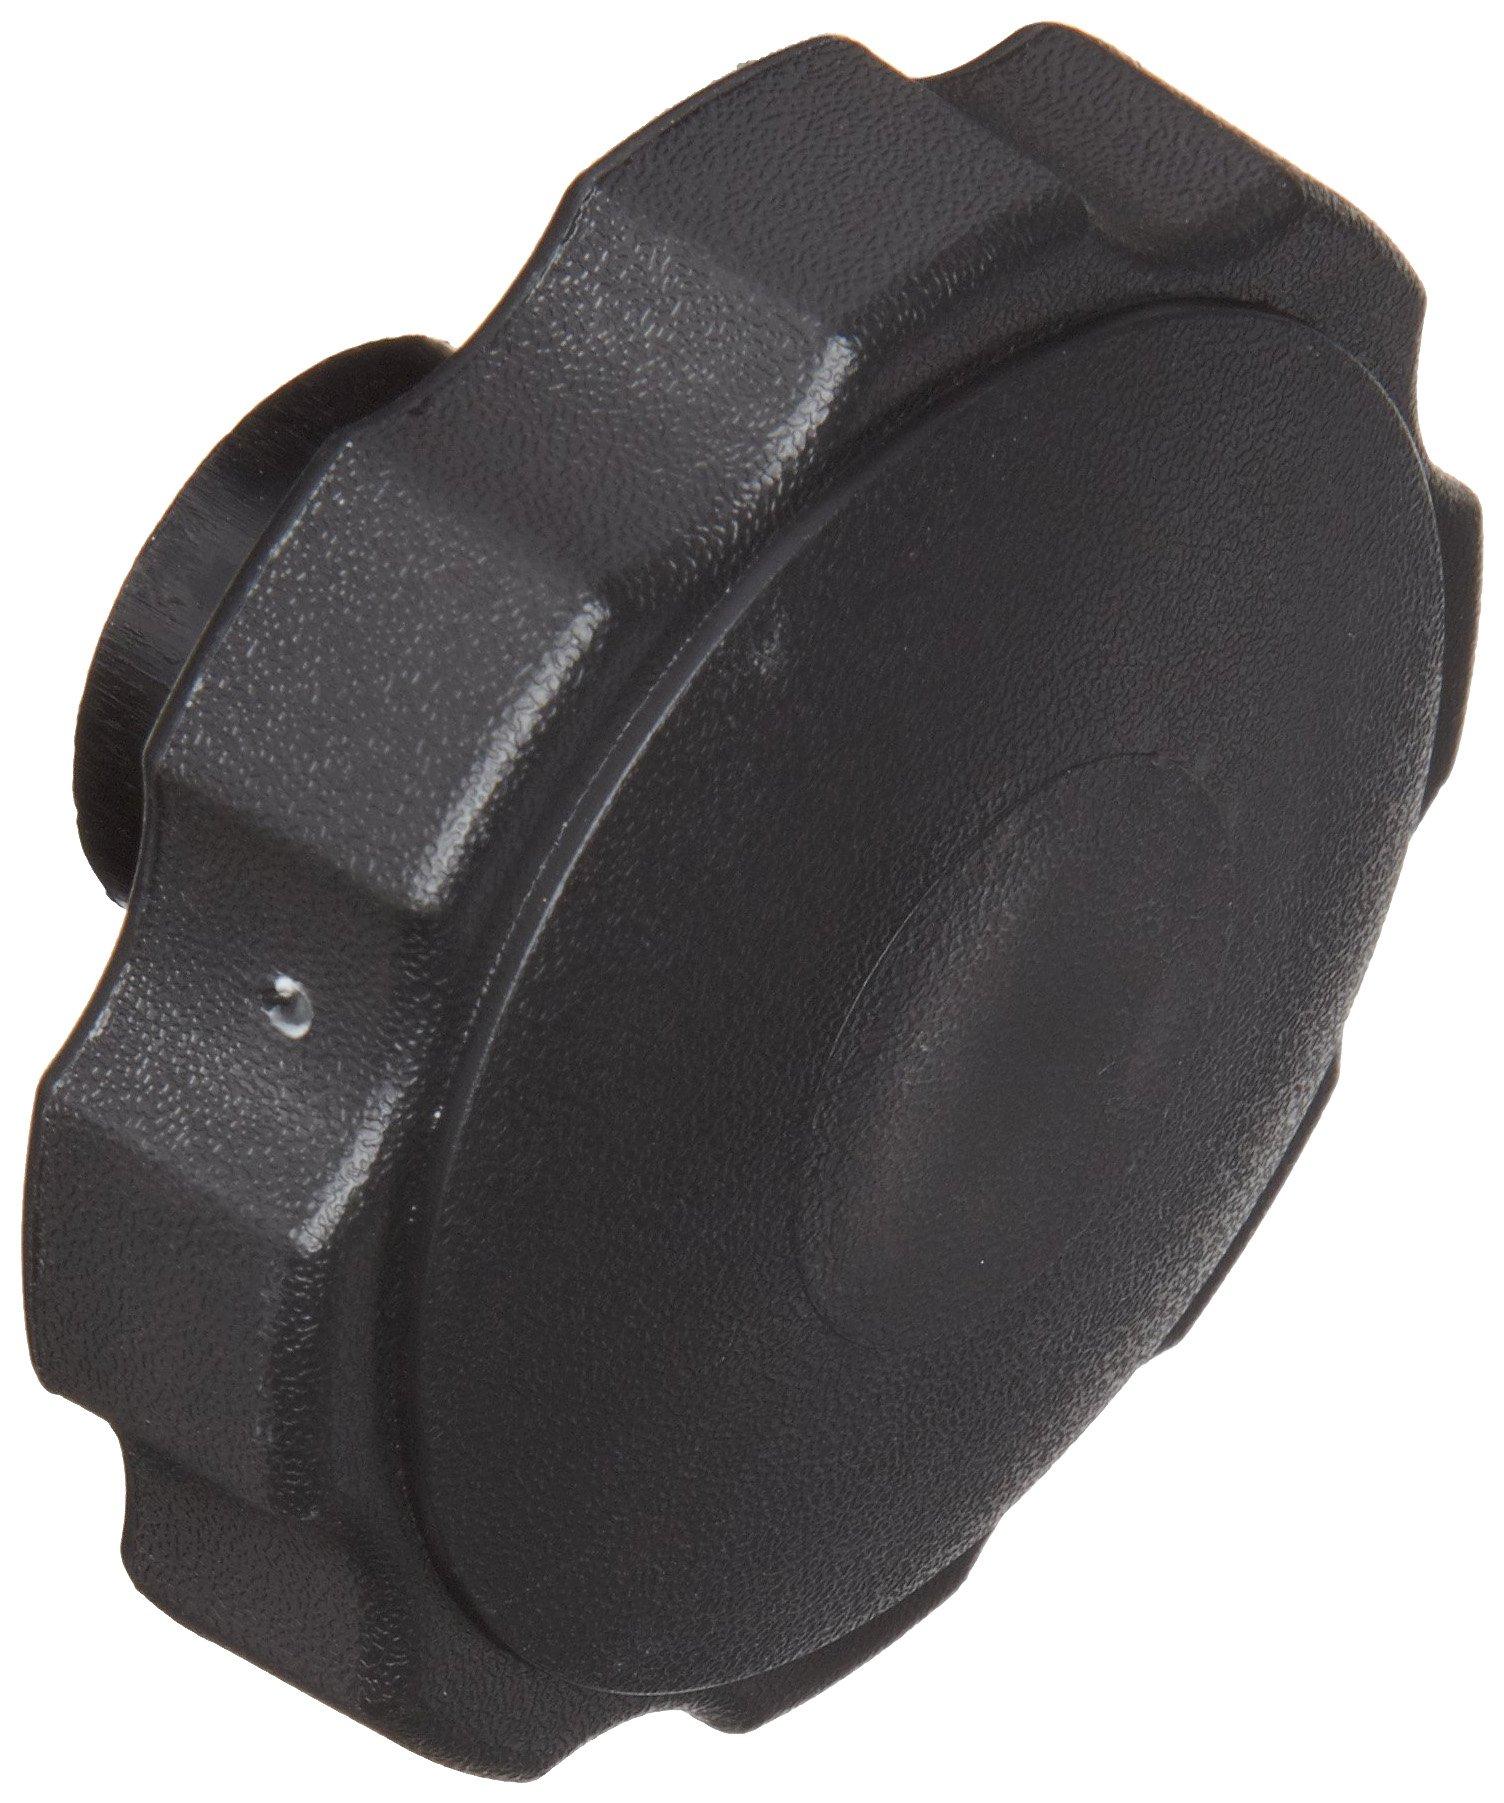 DimcoGray Black Thermoplastic Fluted Torque Knob Female, Brass Insert: 3/8-16 Thread x 5/8'' Depth, 2-3/8'' Diameter x 1-5/16'' Height x 1-1/4'' Hub Dia x 5/8'' Hub Length (Pack of 10)